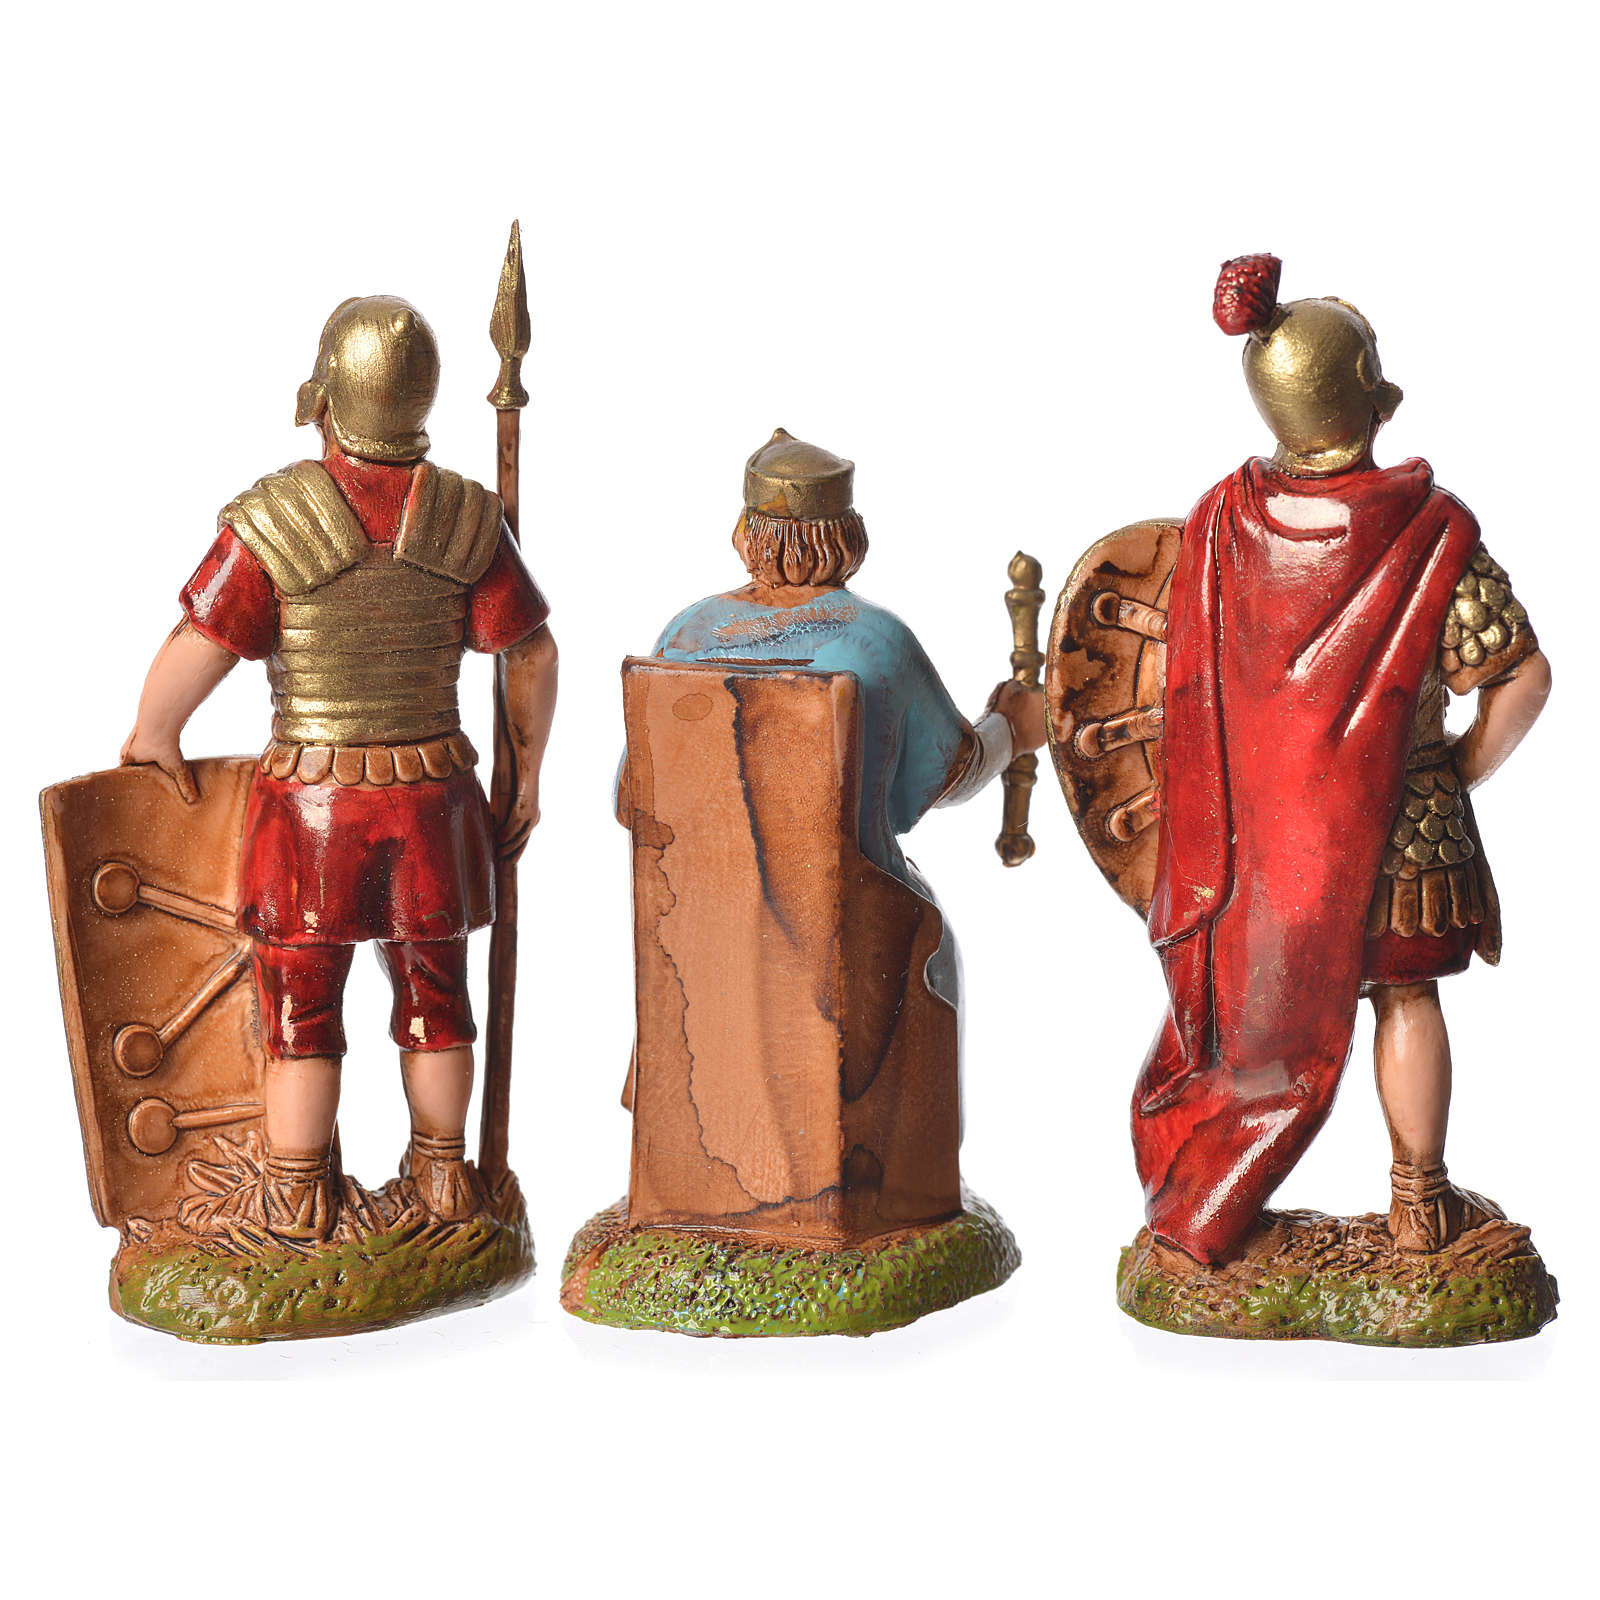 Herod and soldiers, 3 nativity figurines, 6cm Moranduzzo 4